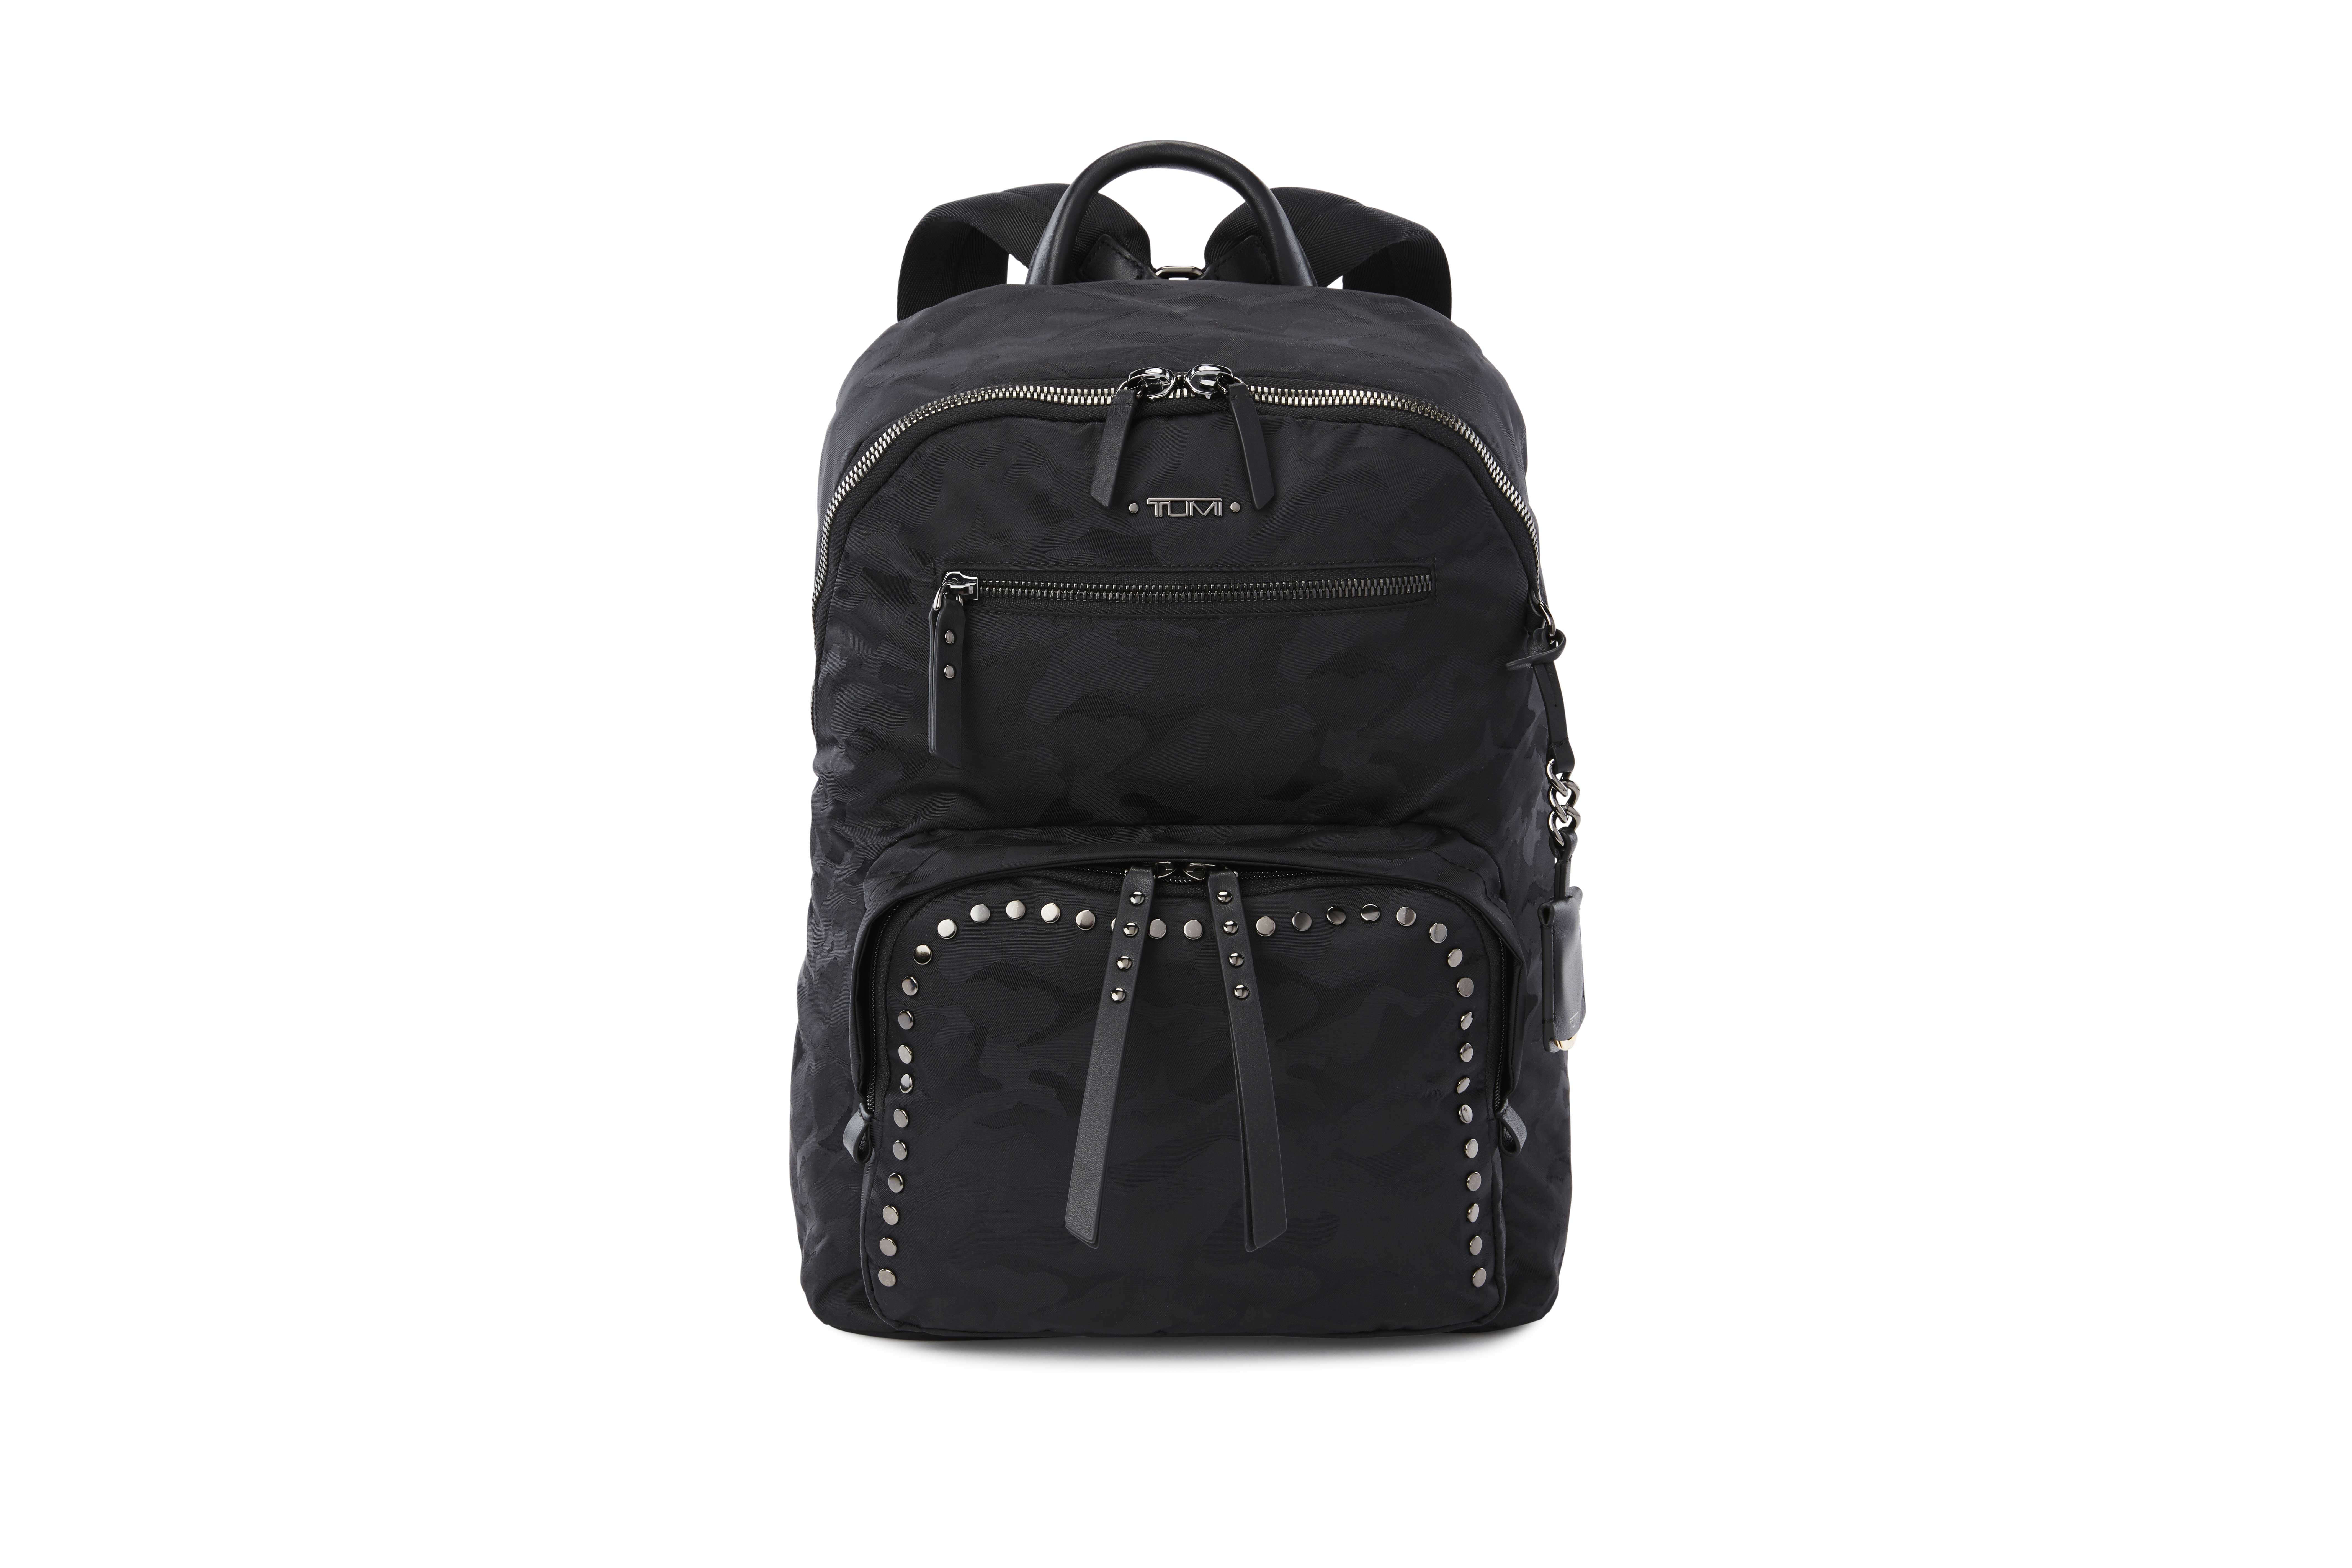 afa29c19e TUMI Voyageur Novelty Hagen Backpack - Black Camo